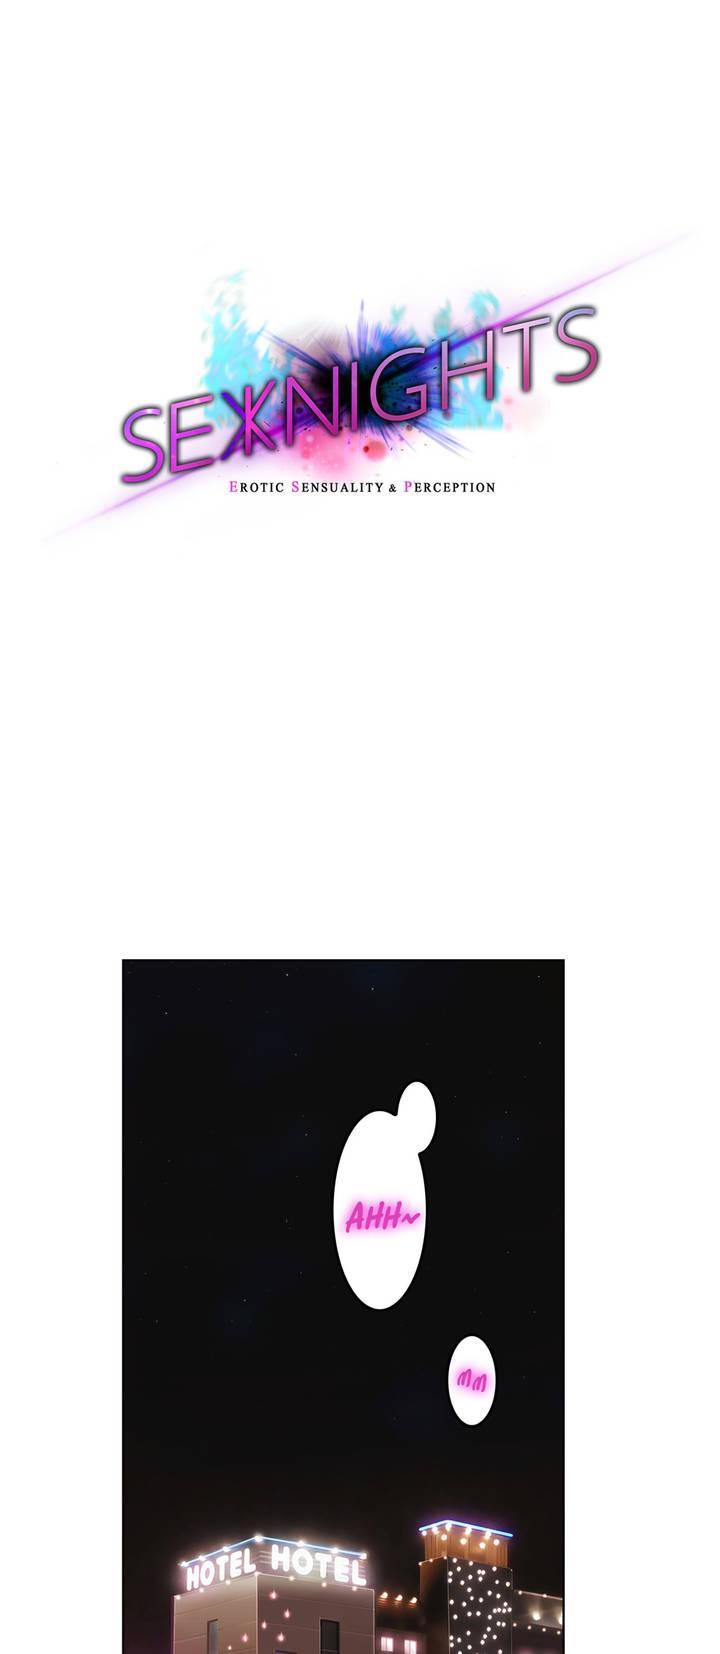 [BYMAN] Sex Knights-Erotic Sensuality & Perception Ch.1-13 (English) (Ongoing) 5